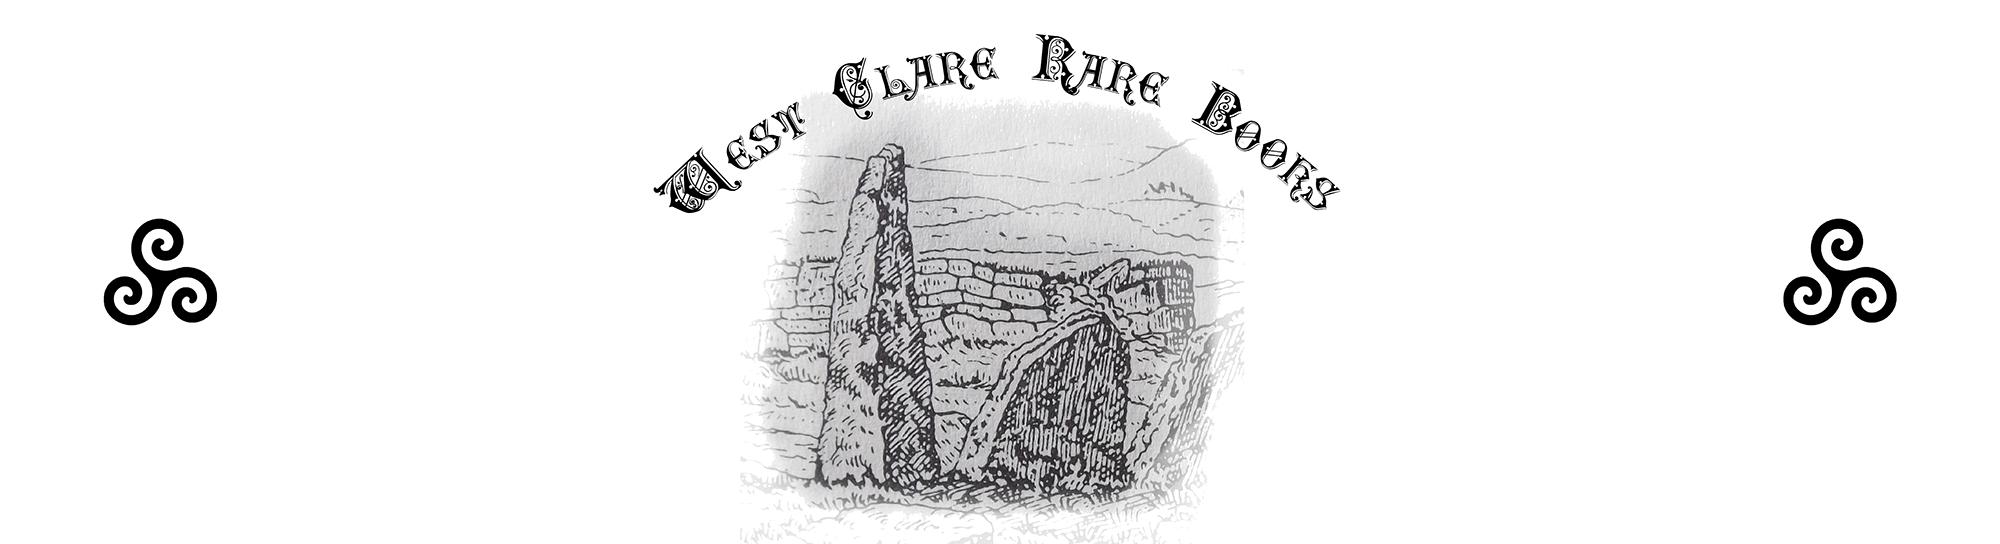 West Clare Rare Books Standing Stones Image